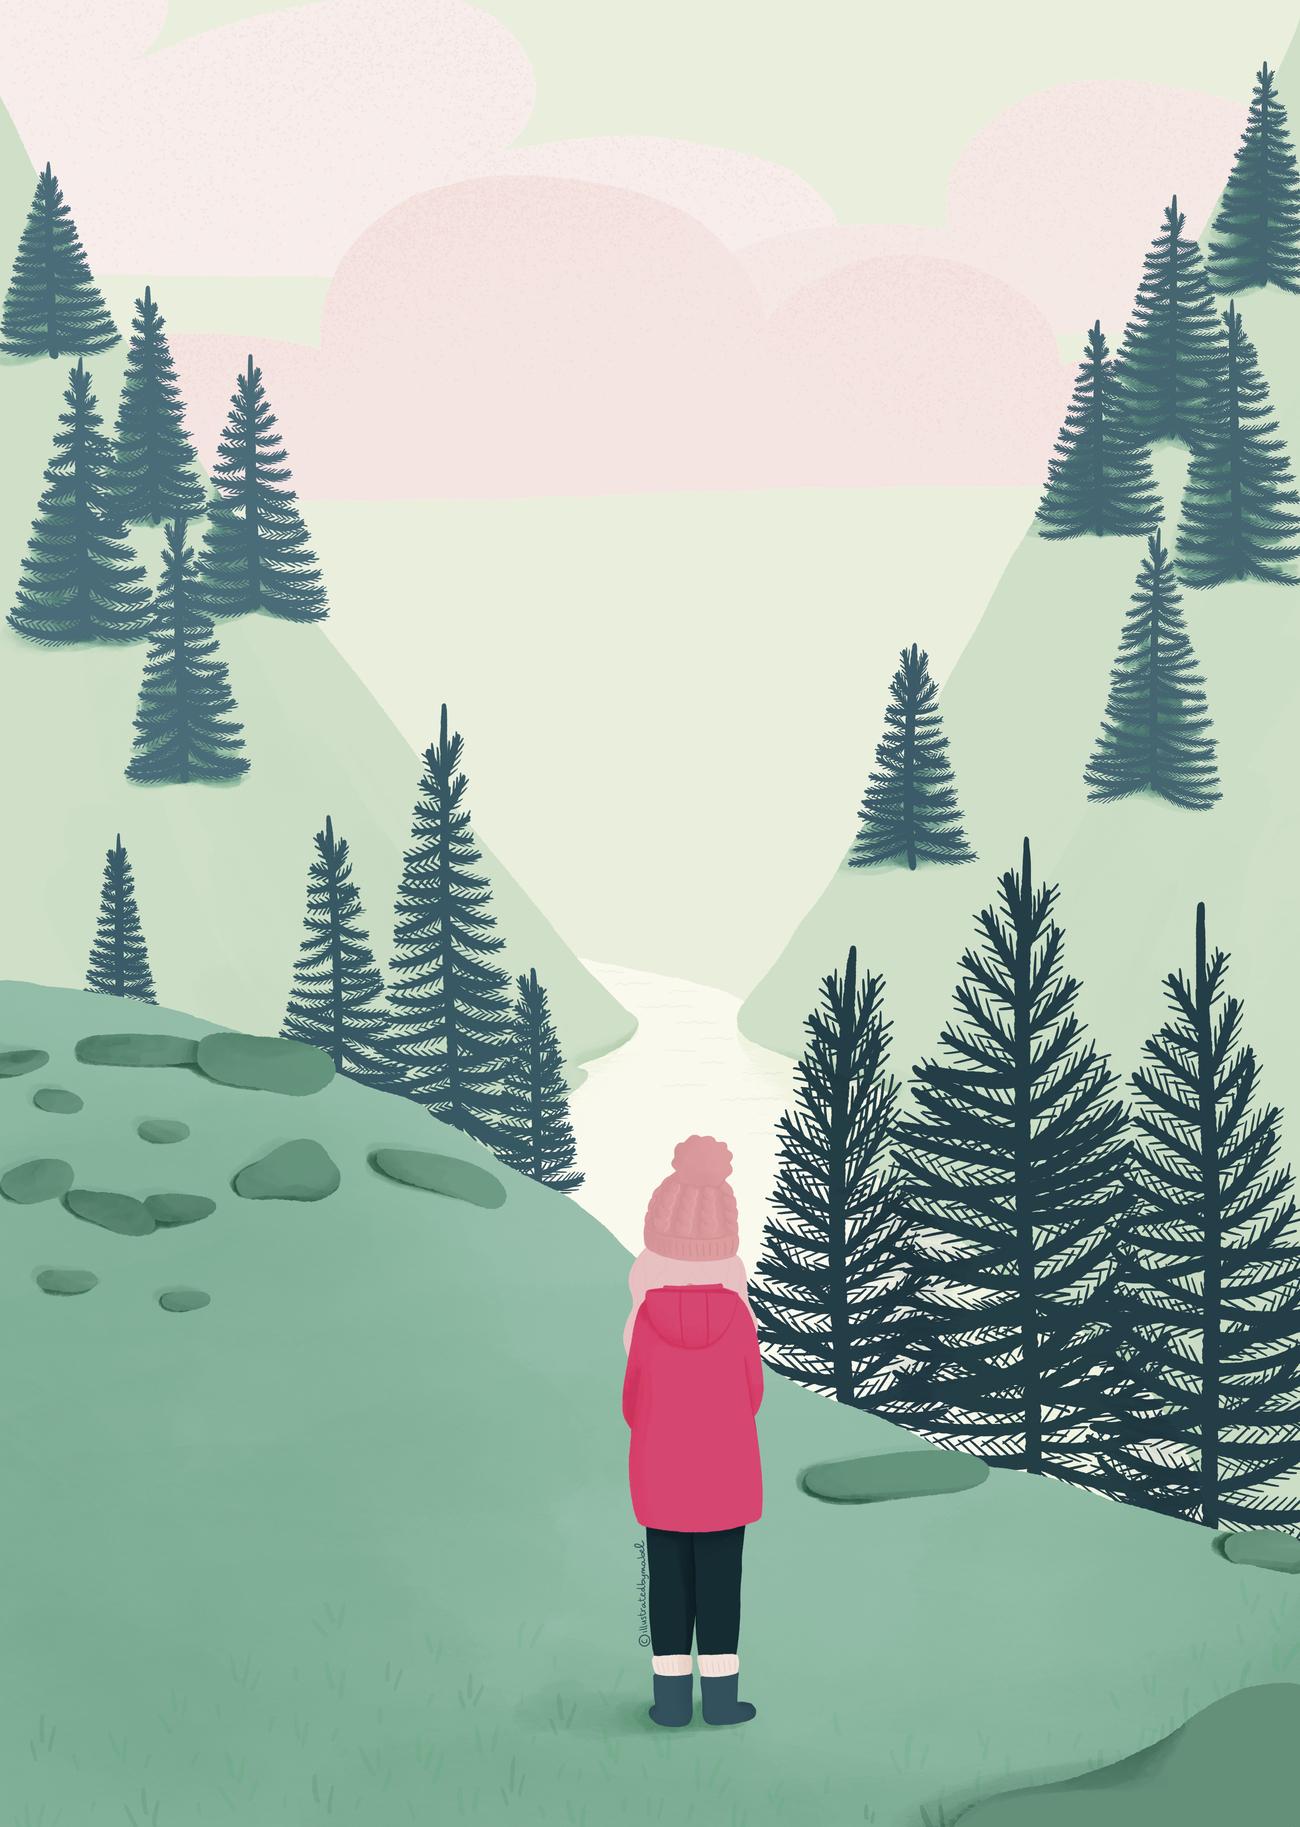 illustration of scottish landscape